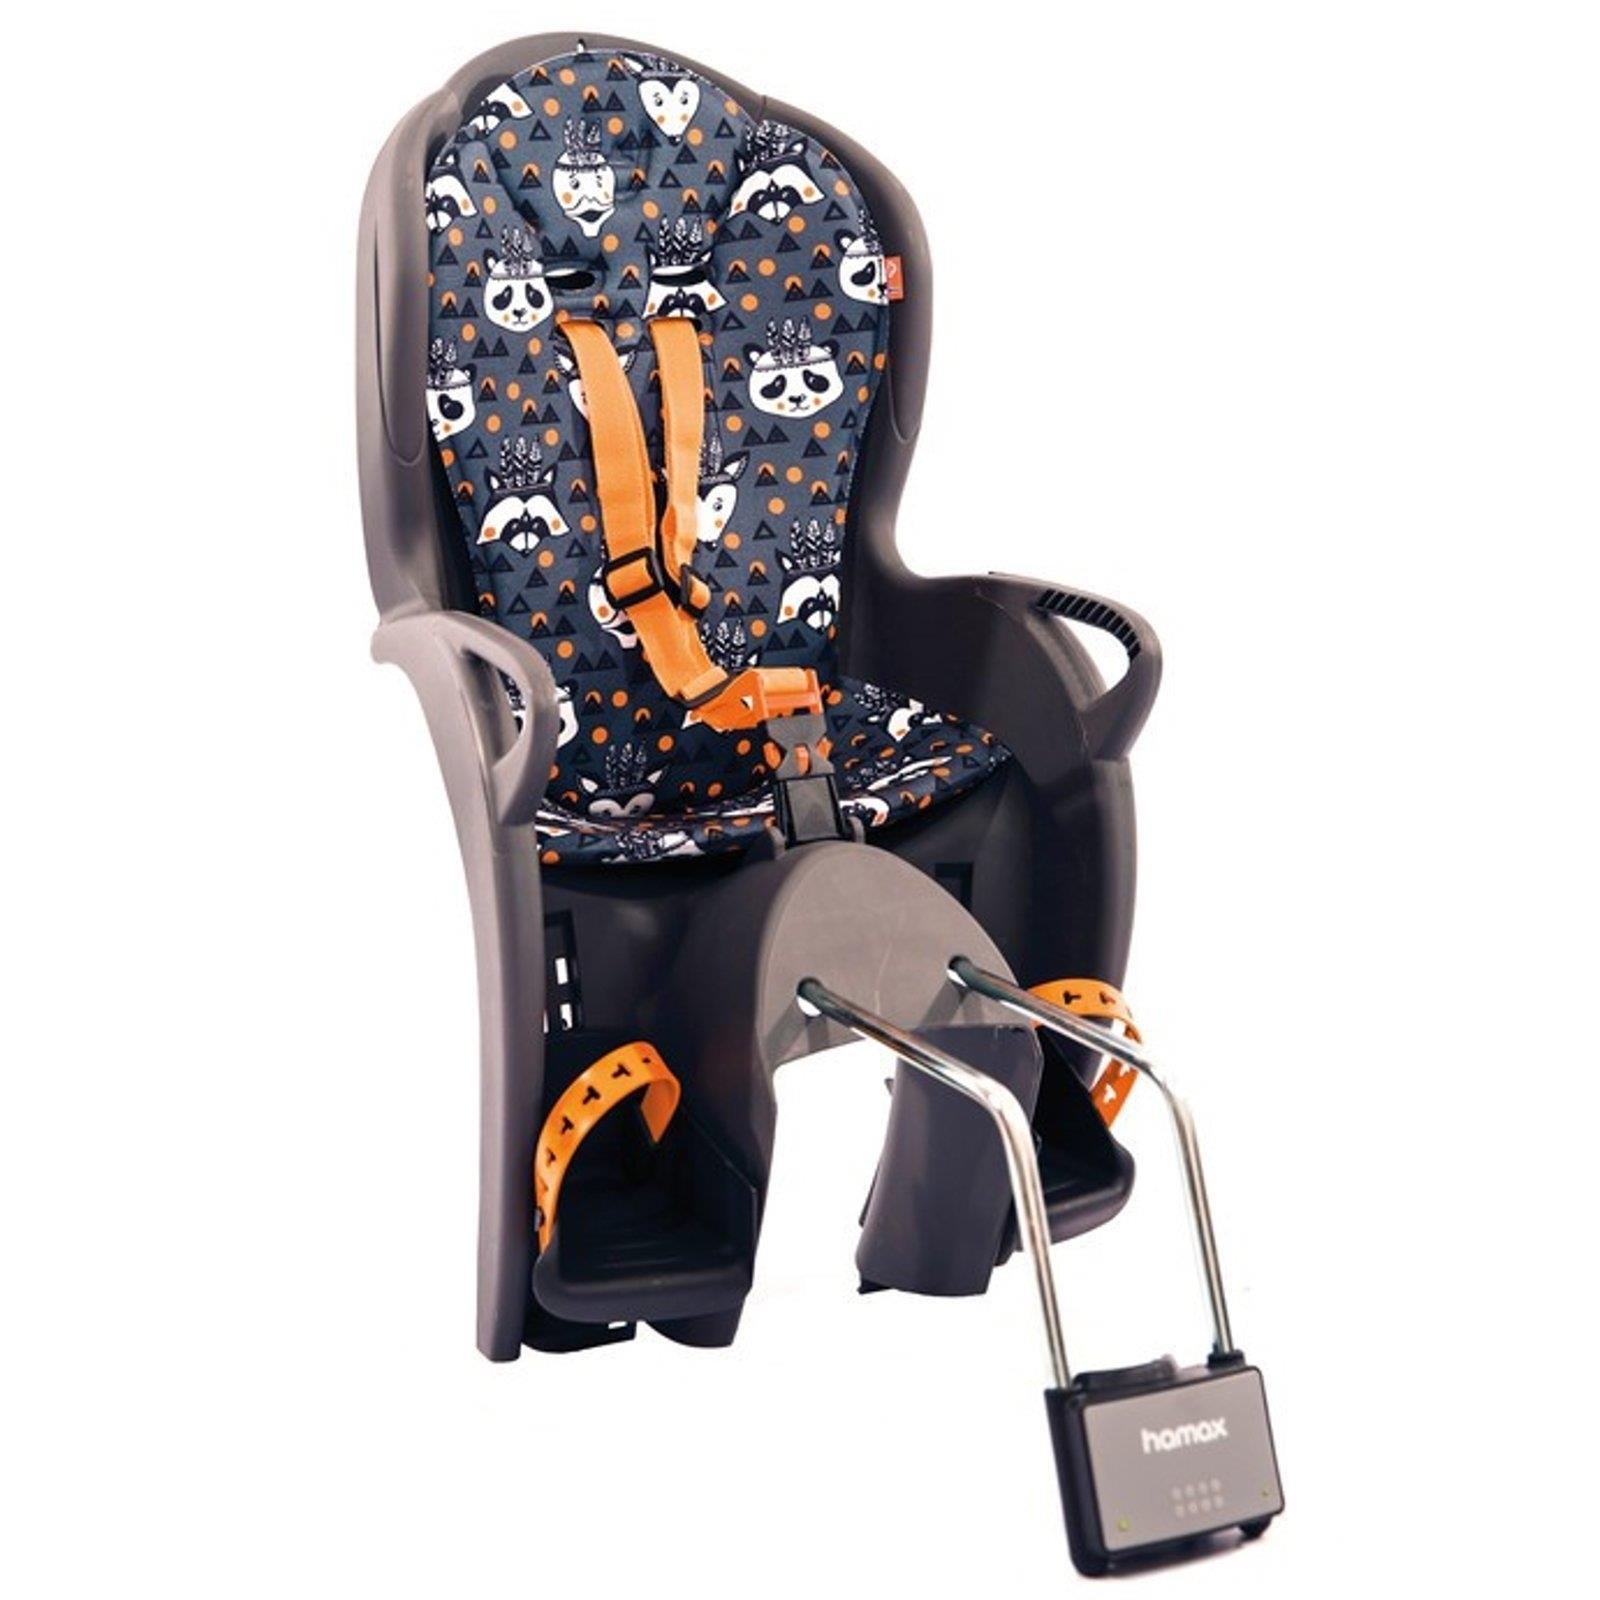 hamax kiss kinder fahrrad sitz 9 monate 22 kg sicherheit. Black Bedroom Furniture Sets. Home Design Ideas